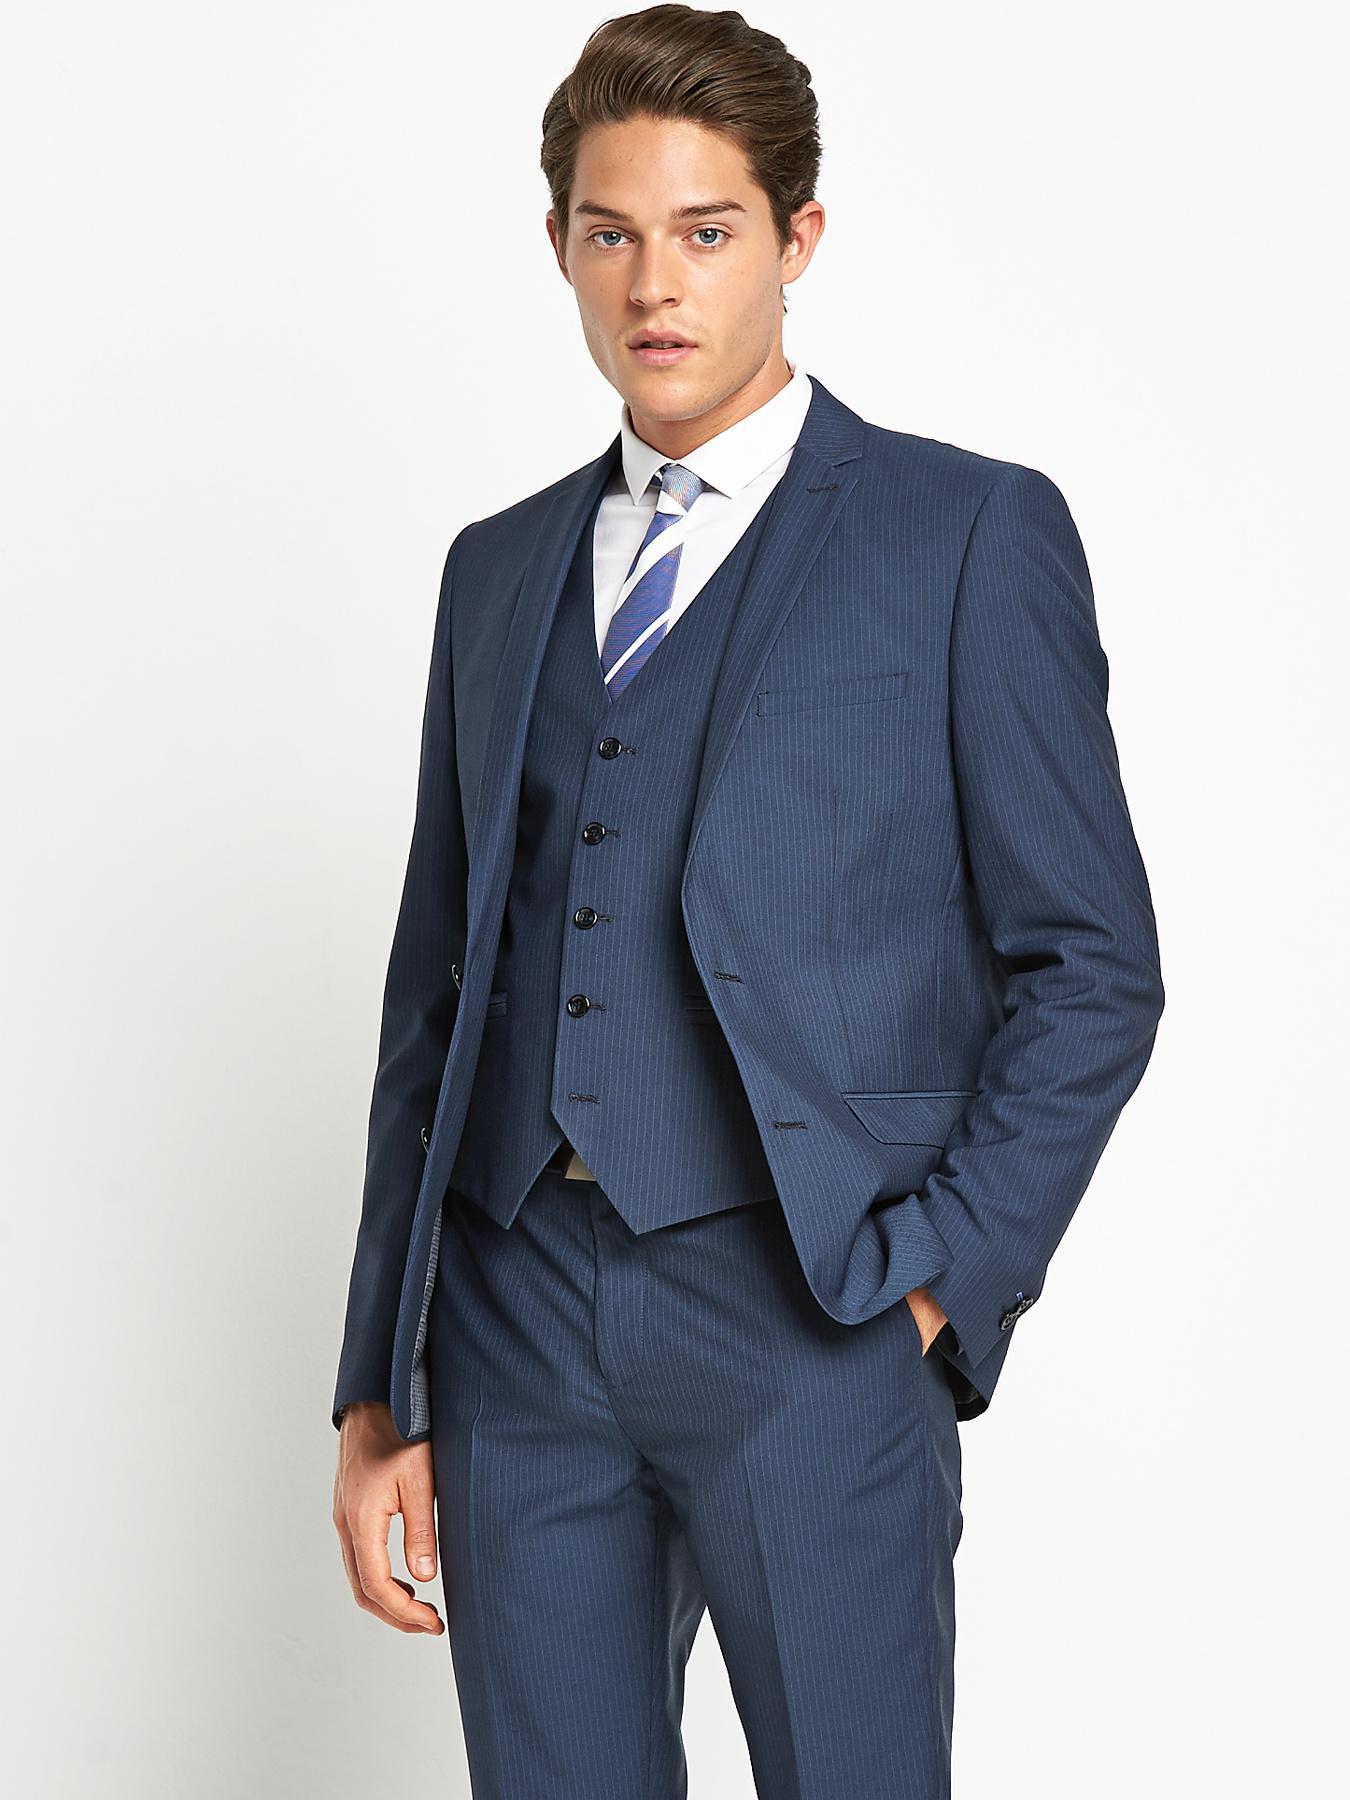 Taylor & Reece Mens Slim Pinstripe Suit Jacket - Blue, Blue